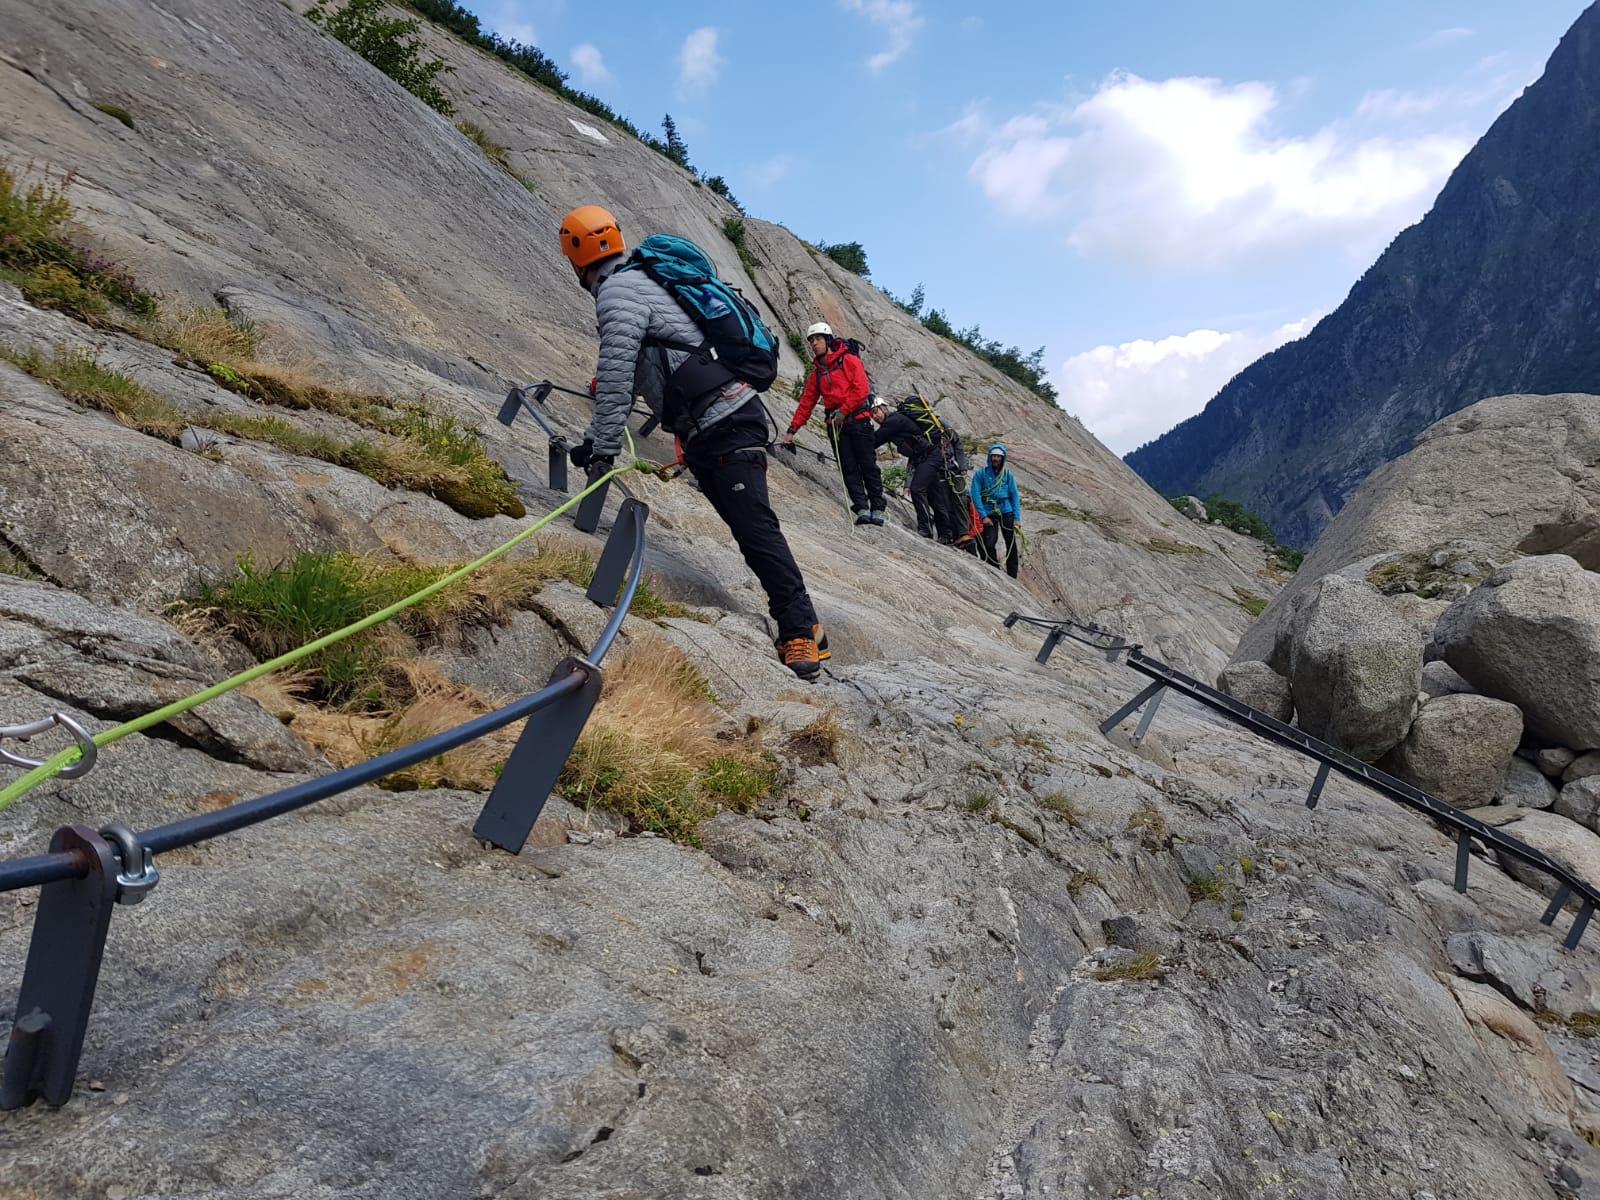 polaris-memovox-reaching-4000m-heigh-at-the-alpes-breithorn-3